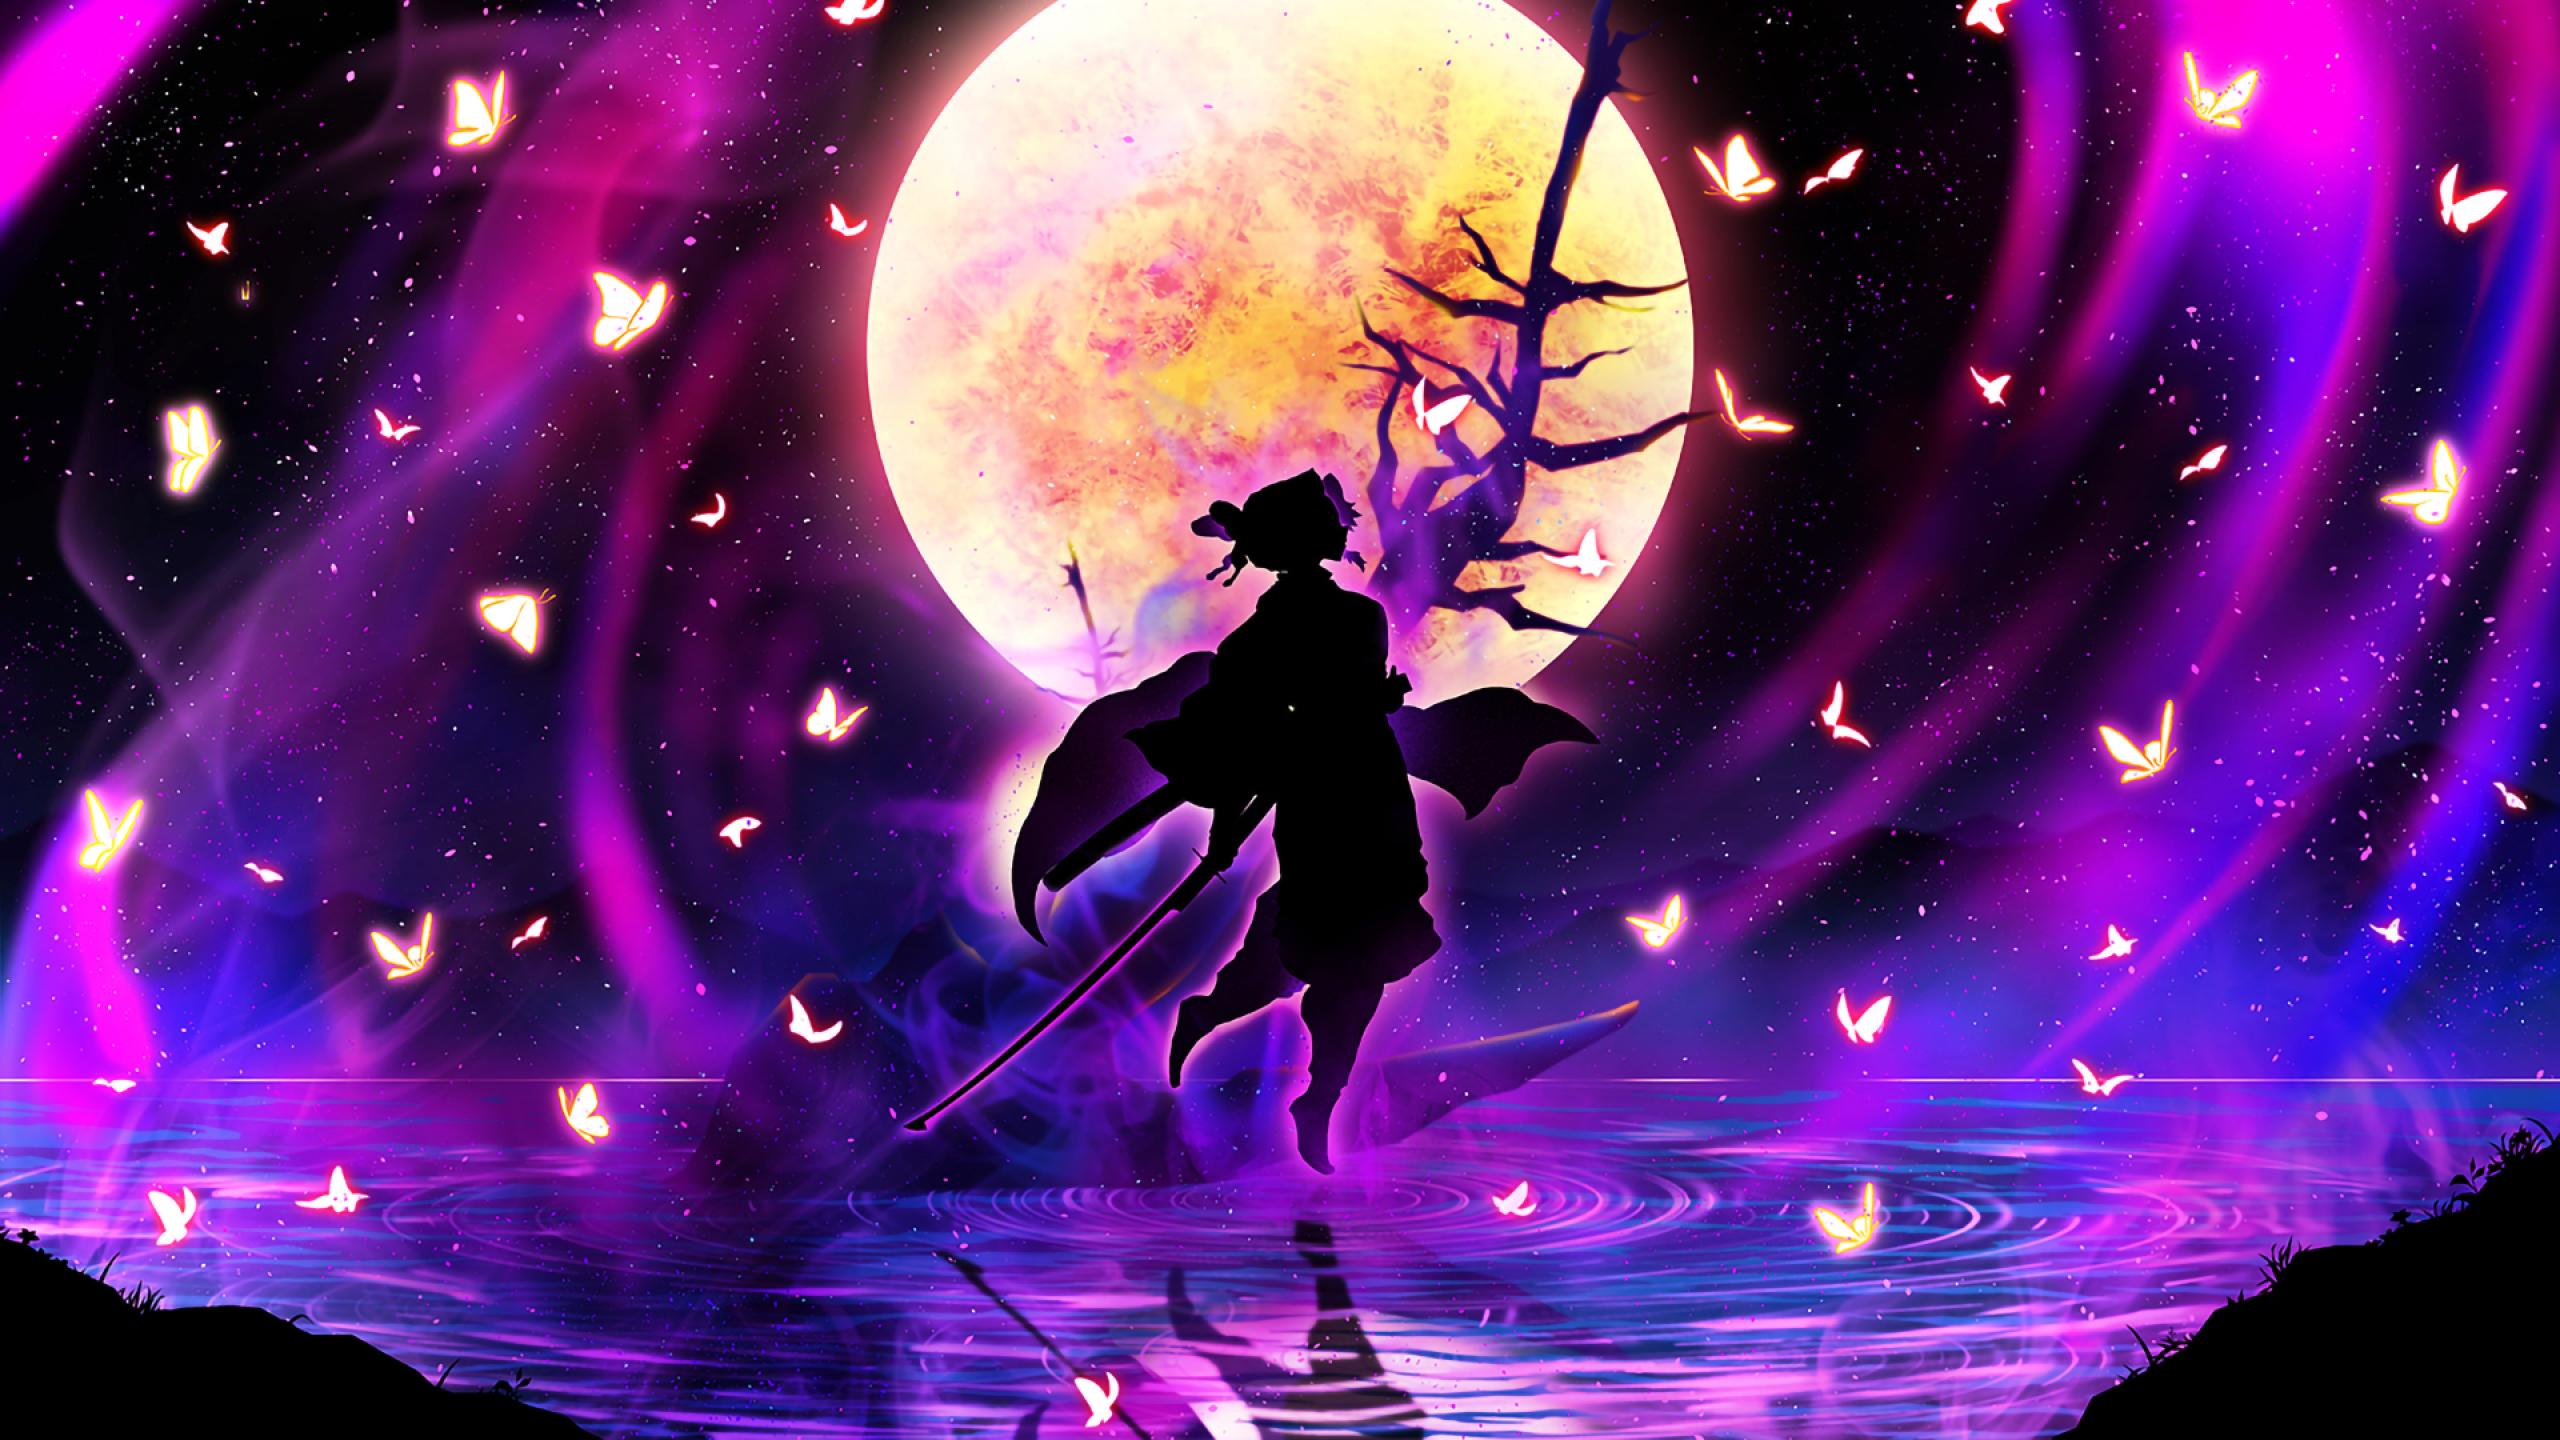 2560x1440 Shinobu Kochou Kimetsu No Yaiba 1440p Resolution Wallpaper Hd Anime 4k Wallpapers Images Photos And Background